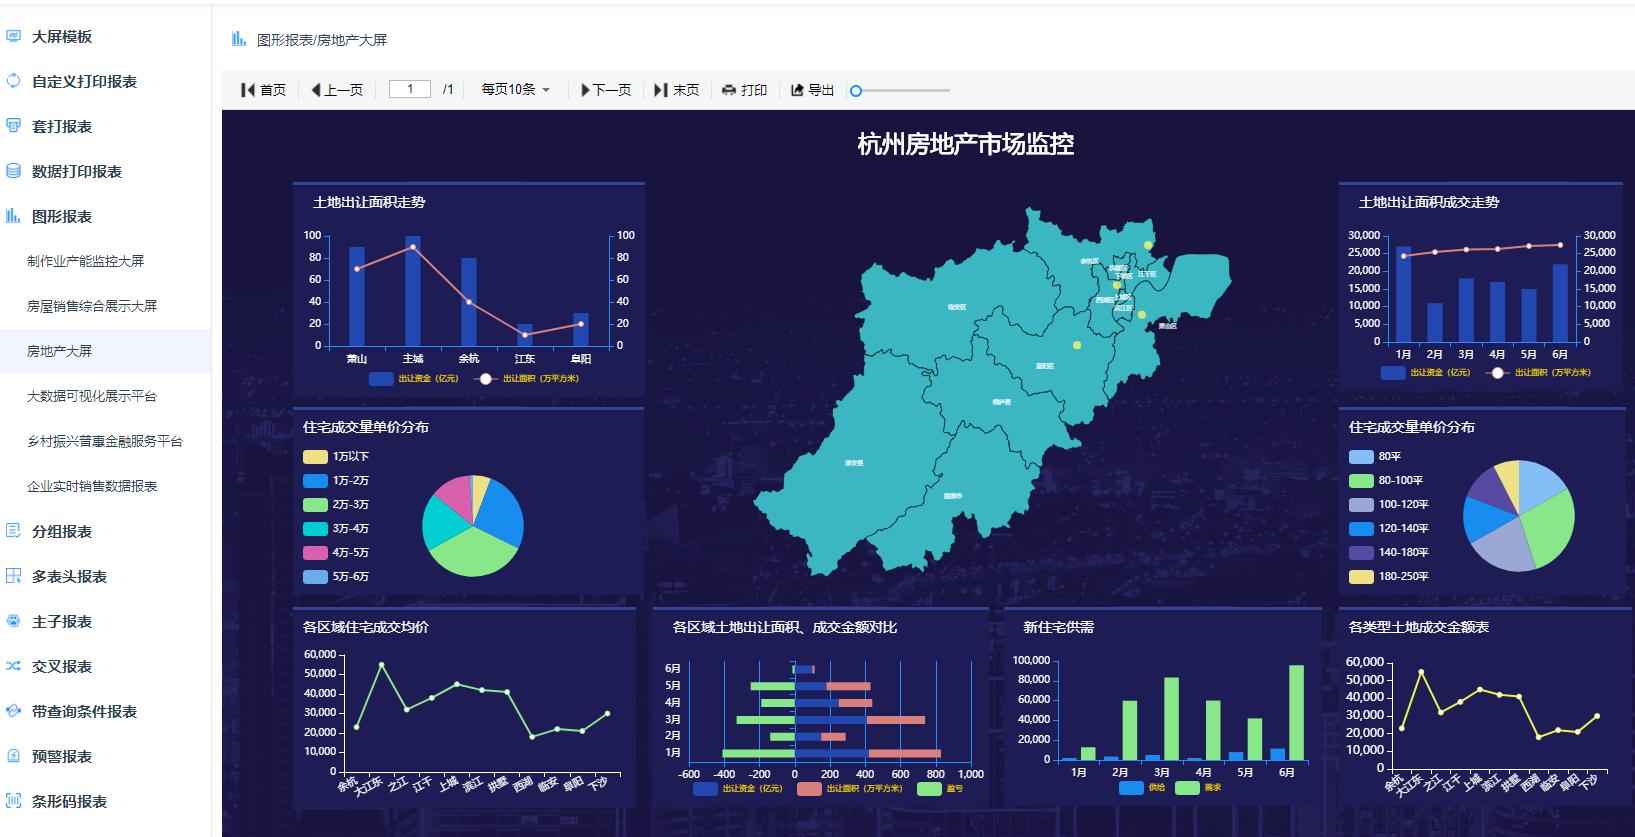 JimuReport积木报表1.3.4 版本发布,可视化报表工具(图7)